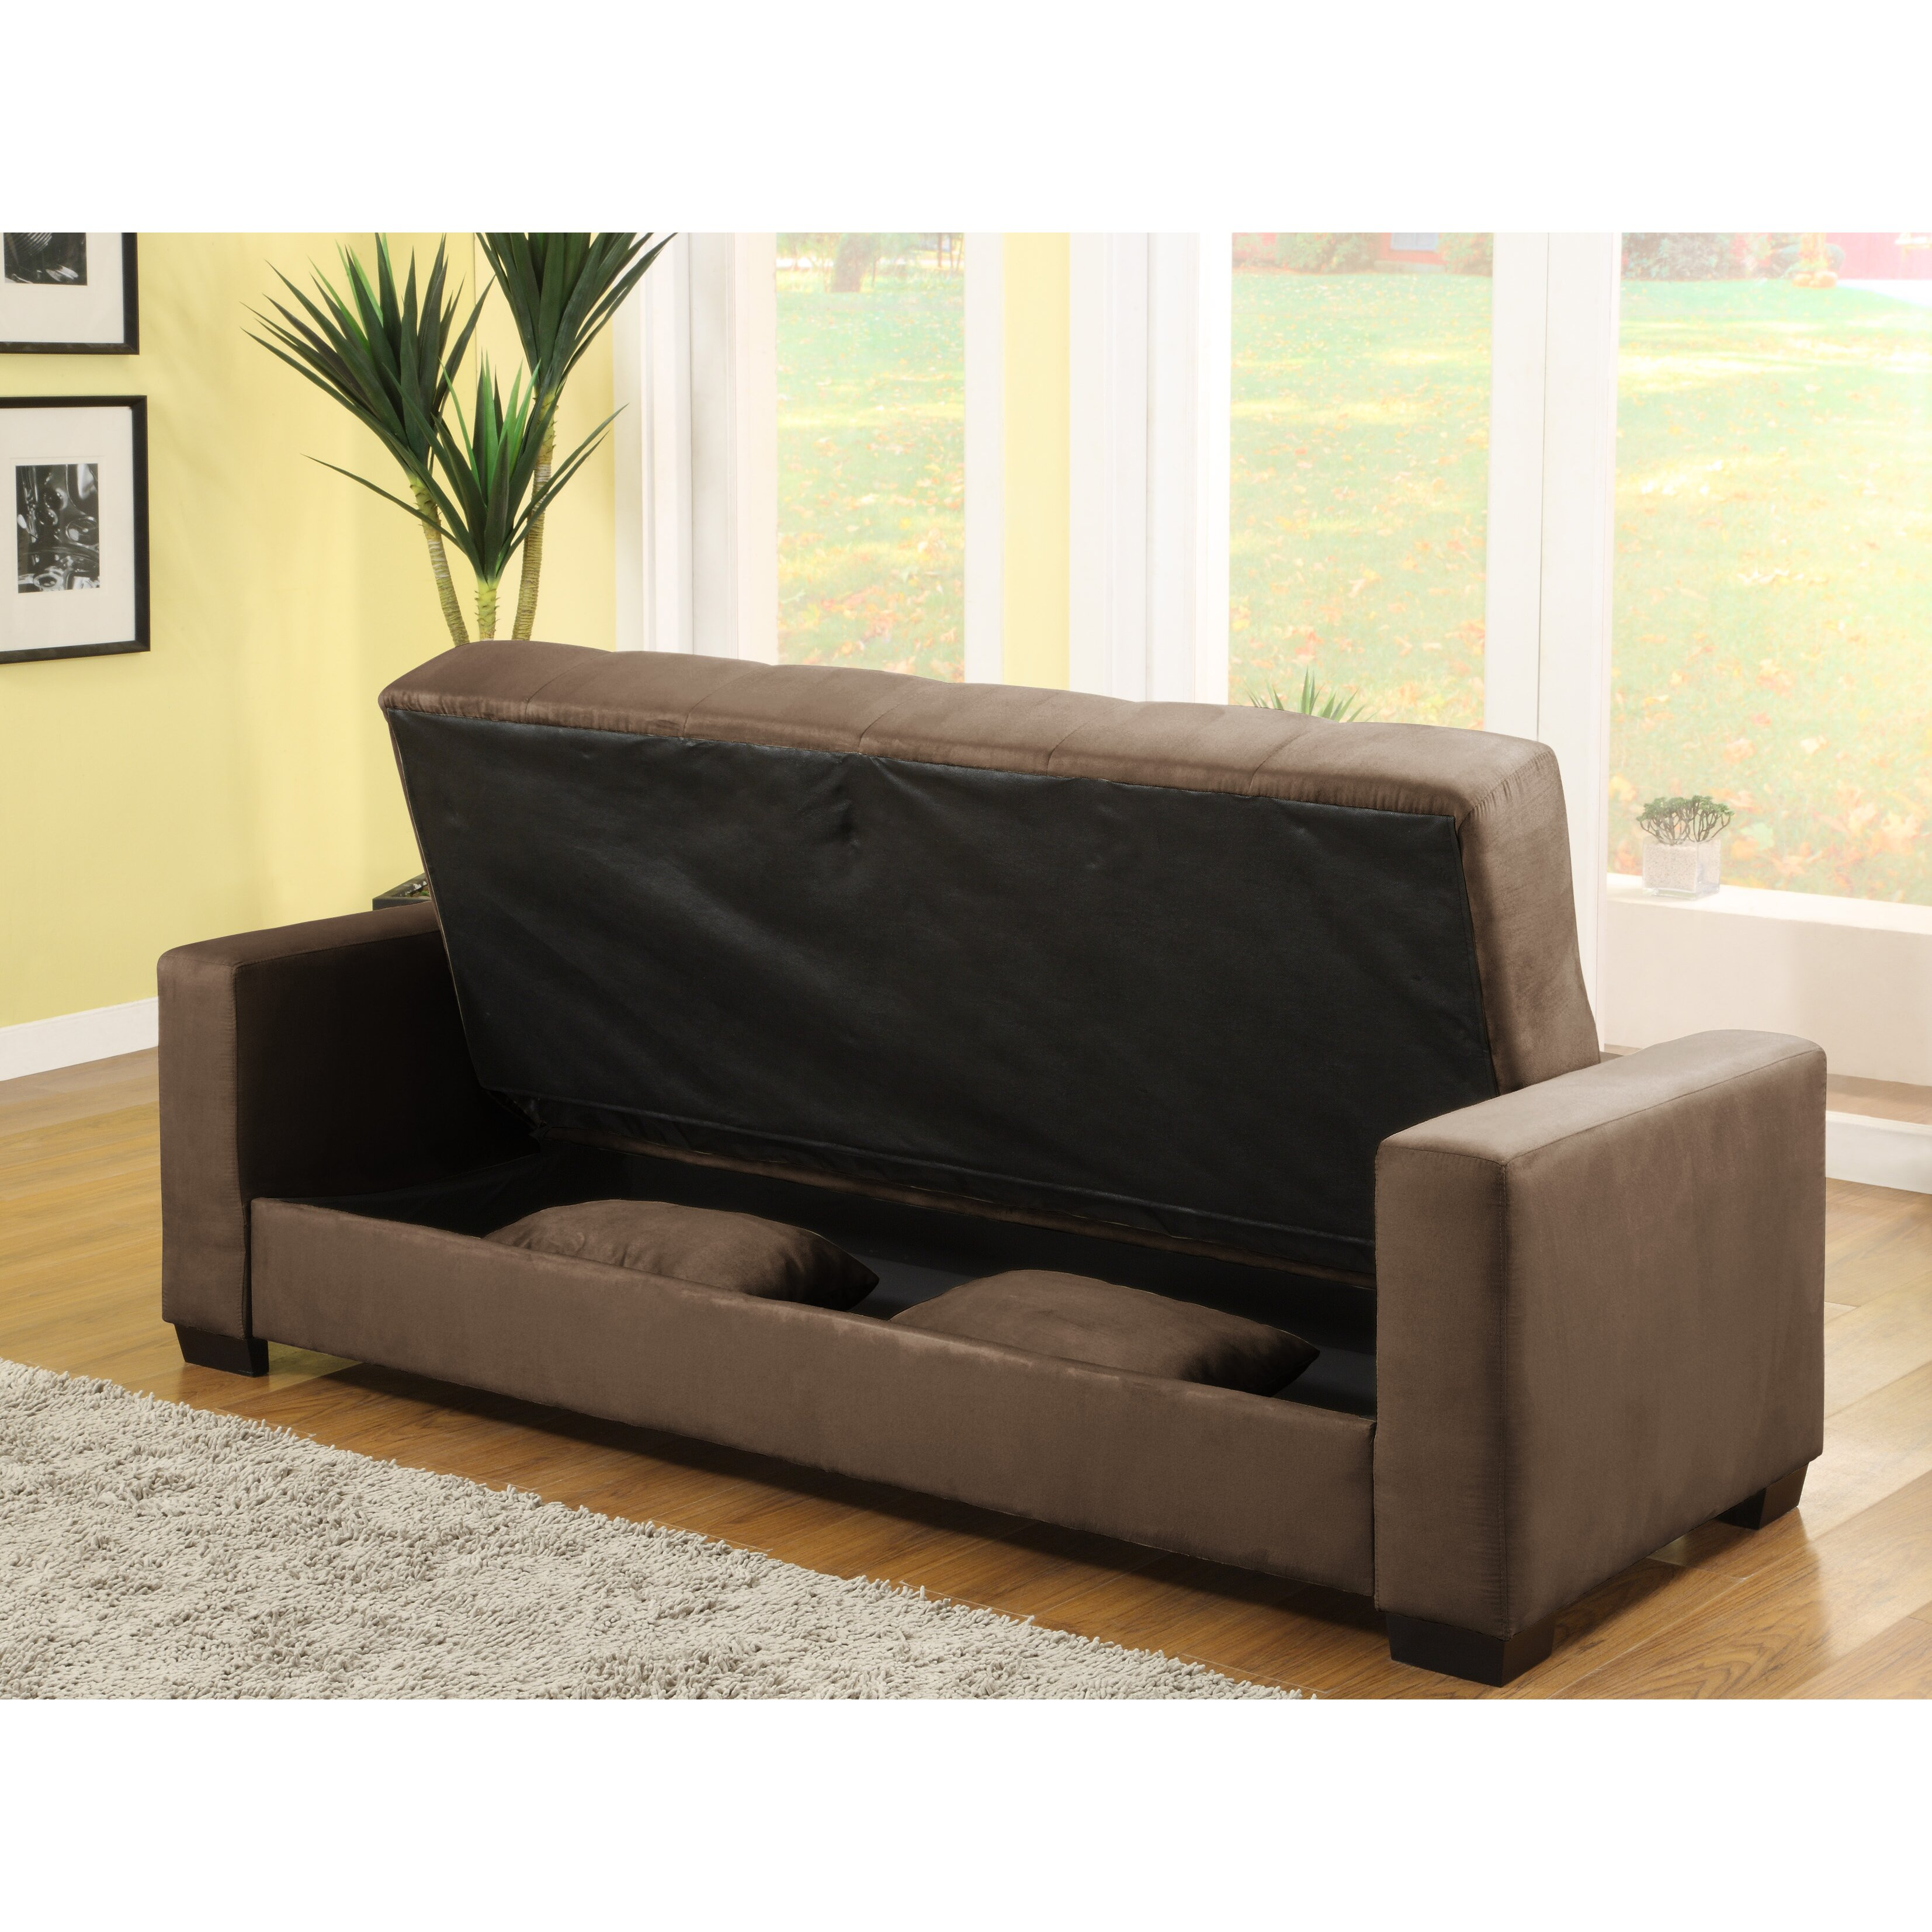 Lifestyle Solutions Napa Sleeper Sofa Reviews Wayfair